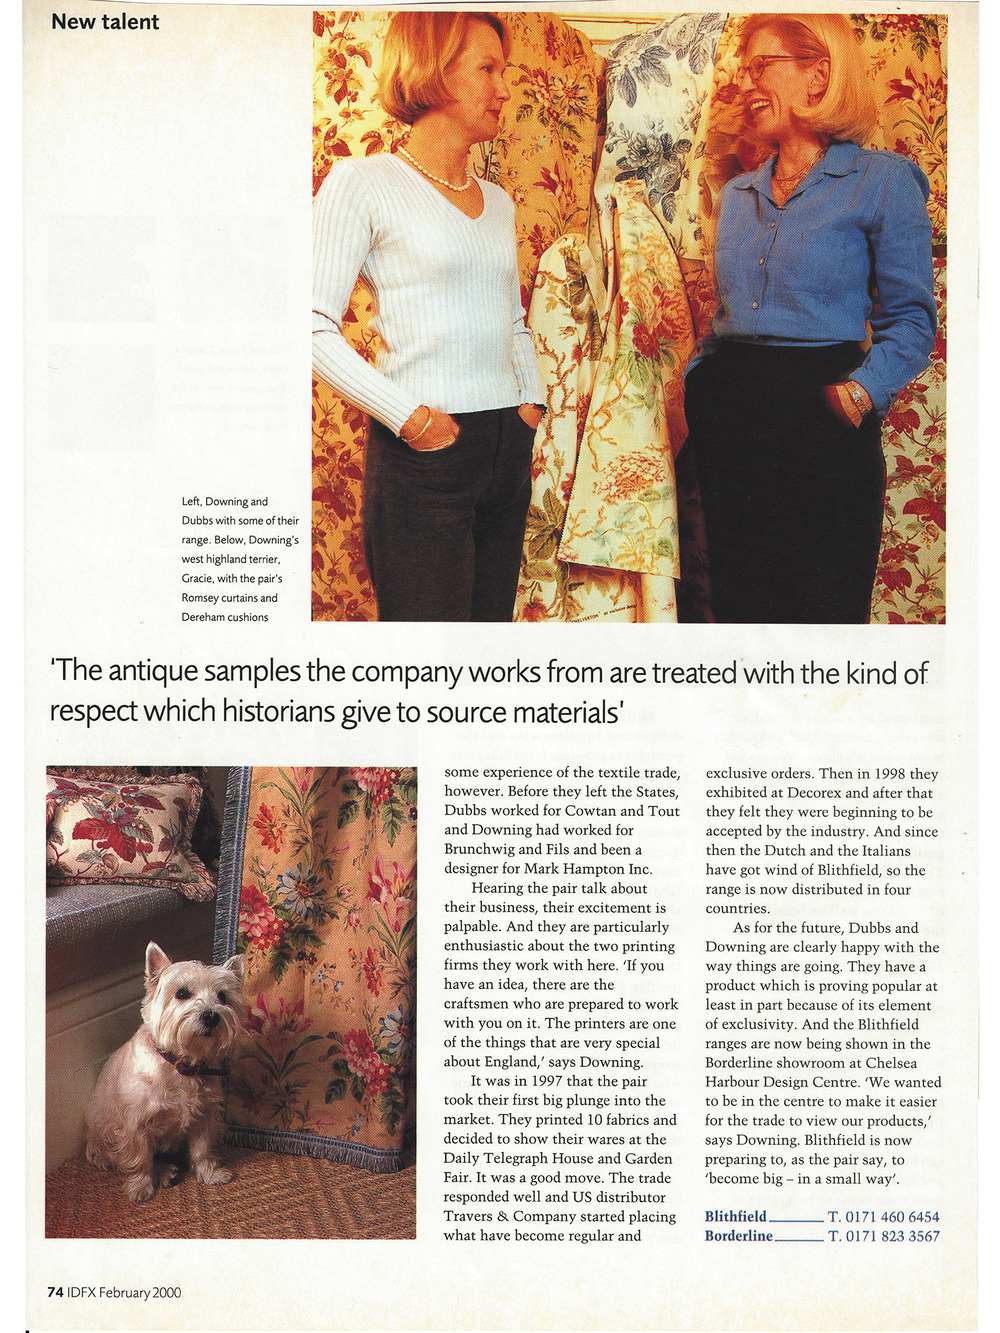 2000 February-IDFX Page 4 of 4.jpeg